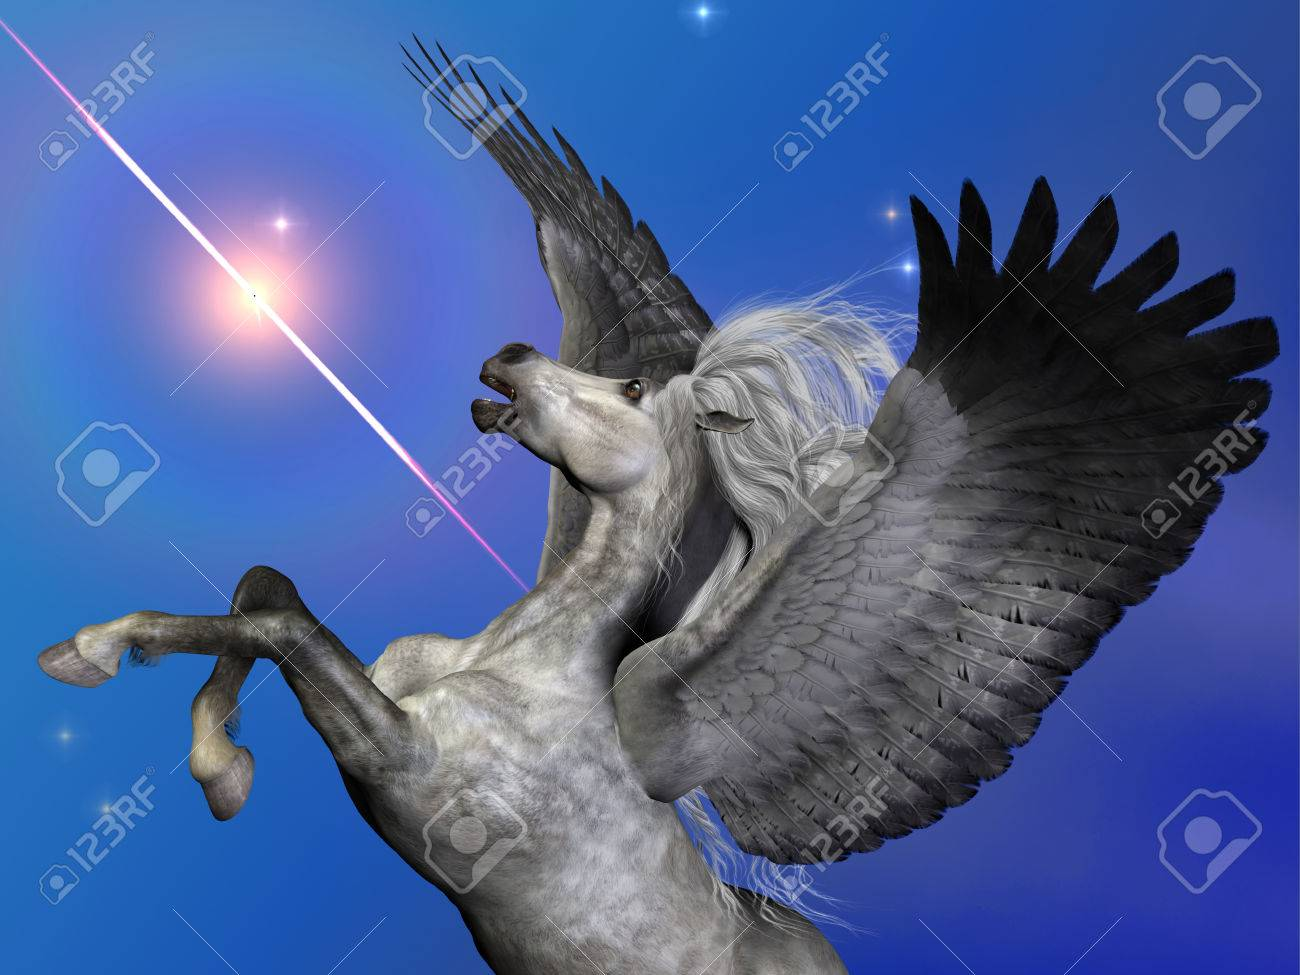 starburst pegasus pegasus is a flying winged horse of ancient